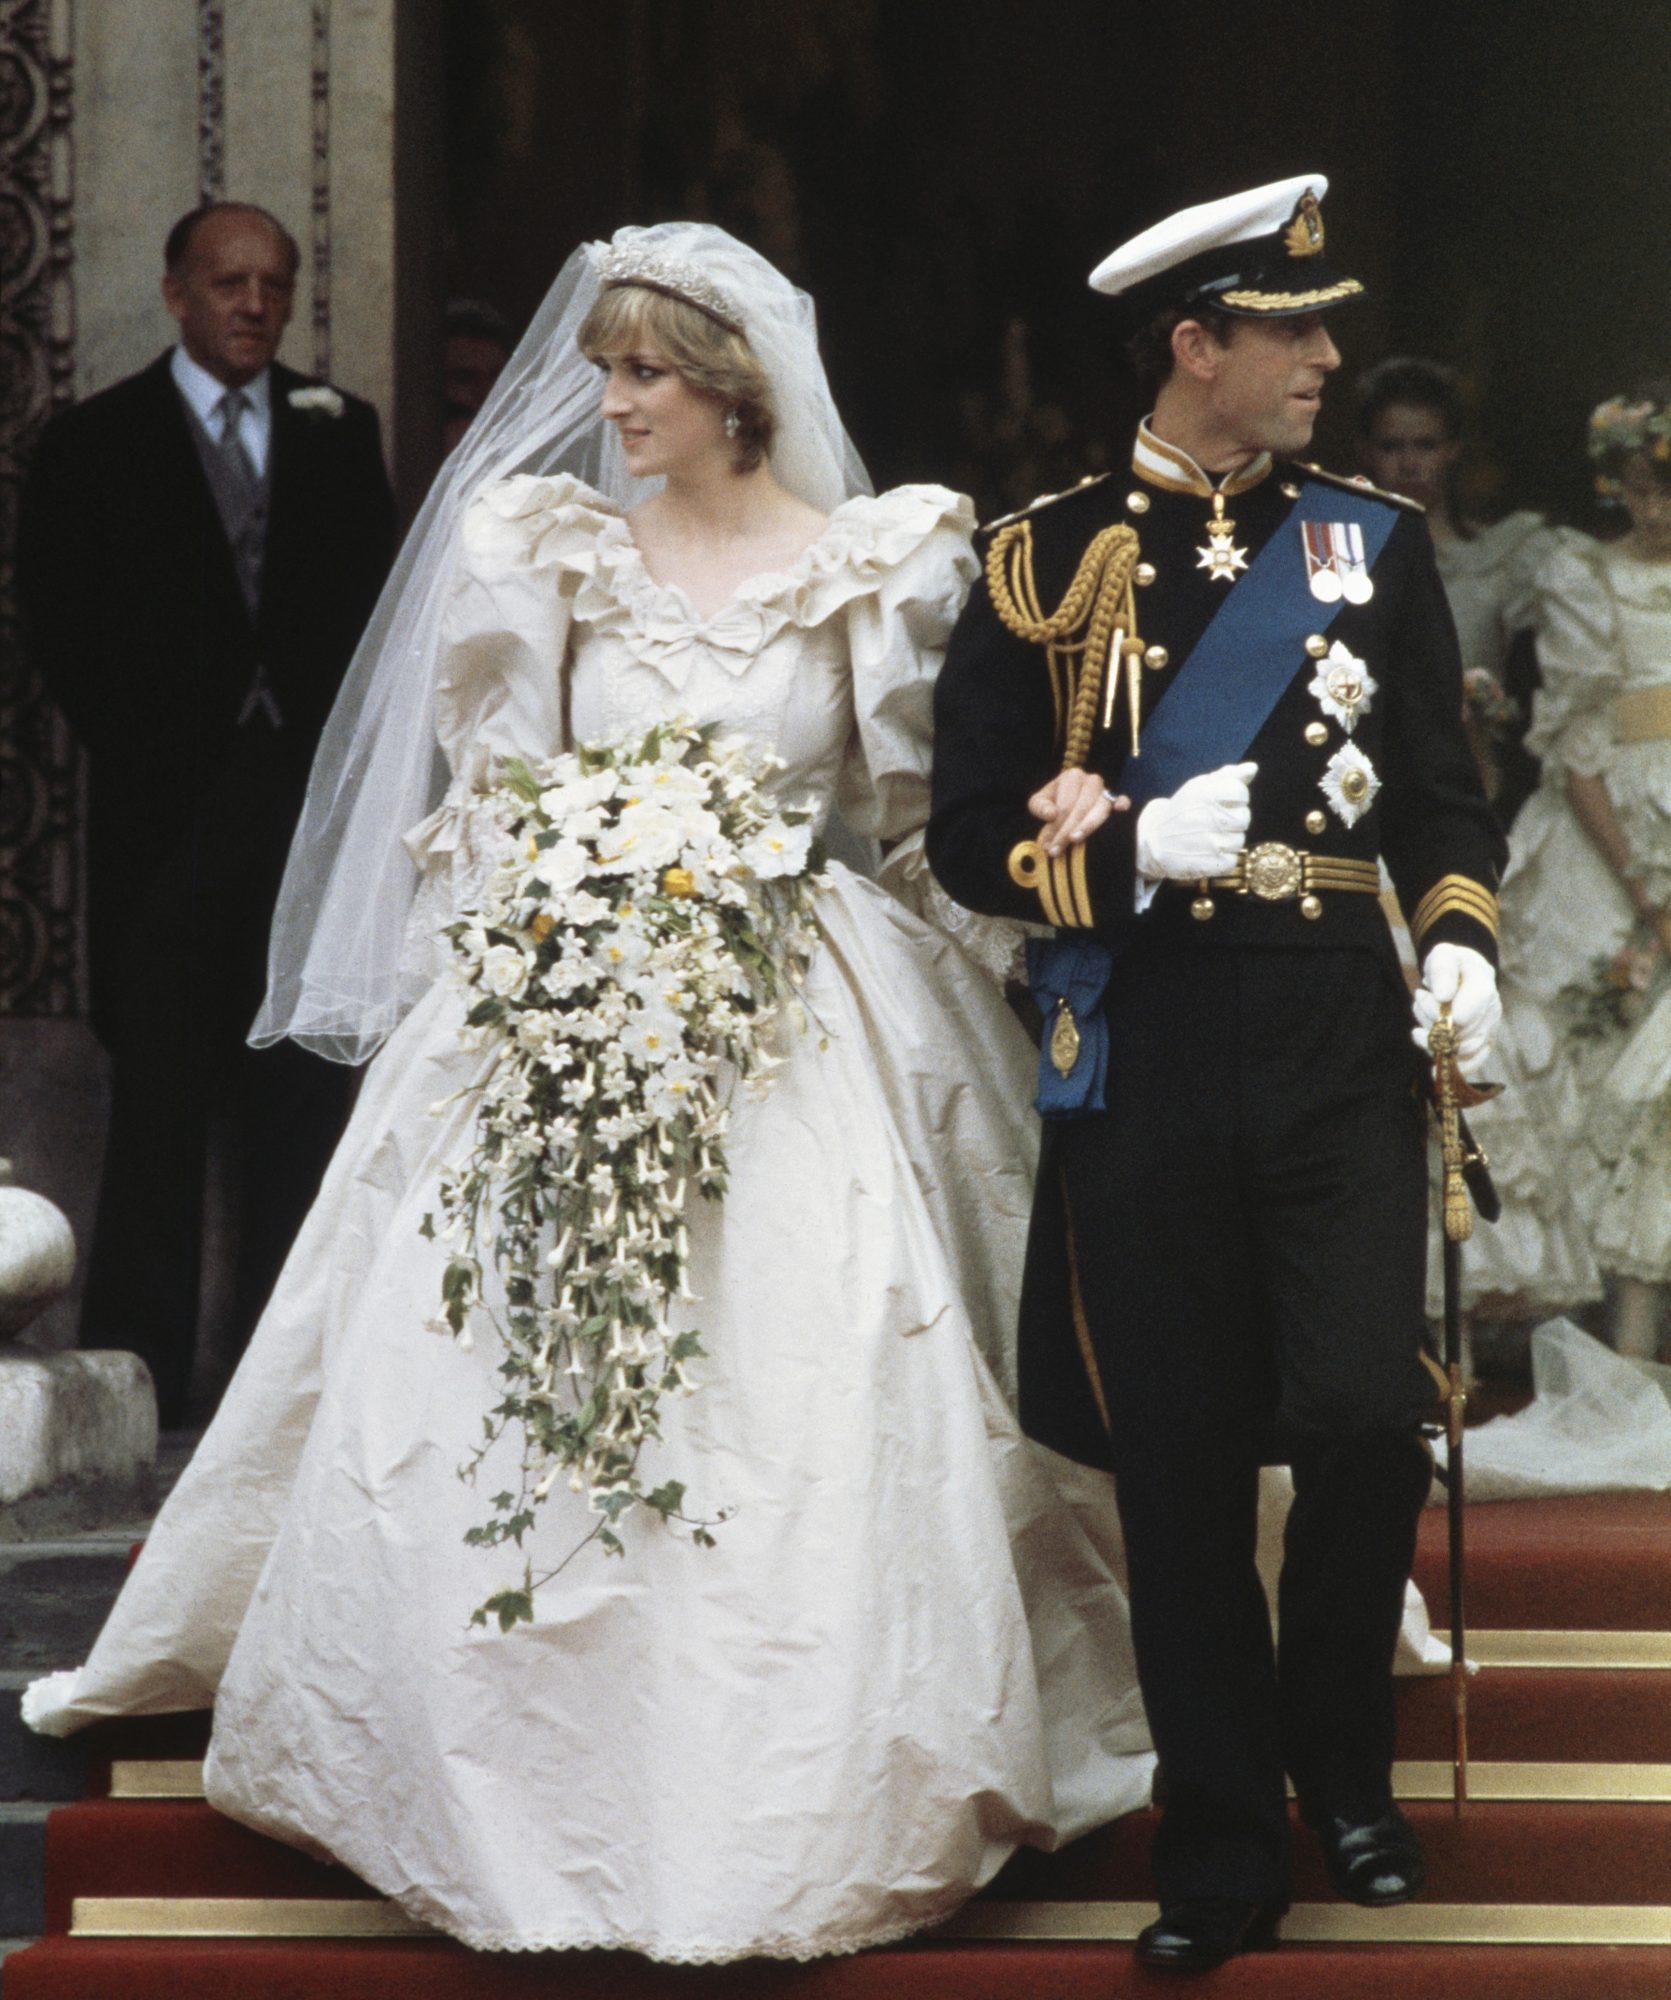 Royal Wedding Of Prince Charles And Diana Spencer